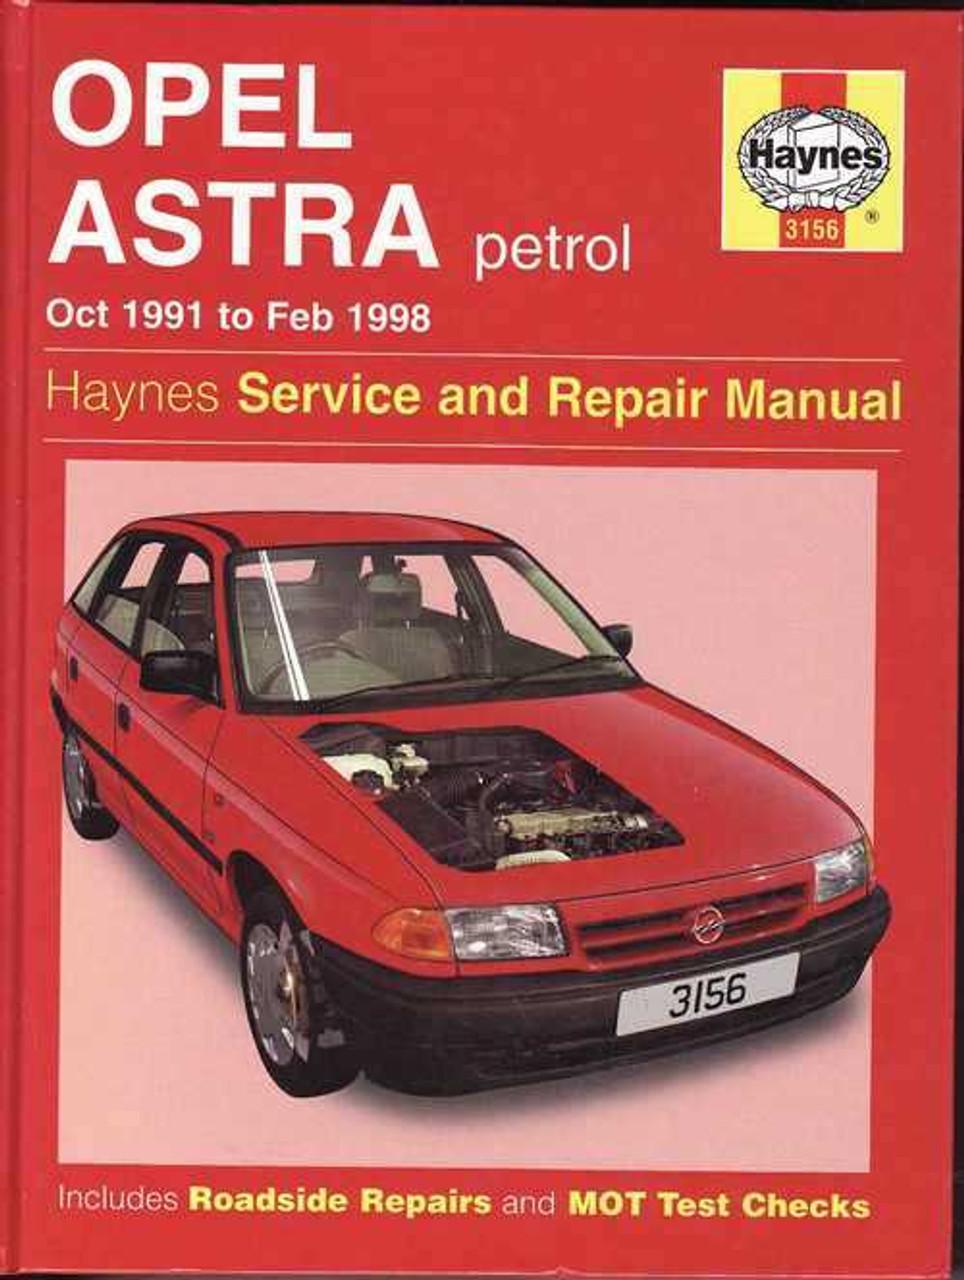 Holden Astra (Opel) Petrol 1991  1998 Workshop Manual